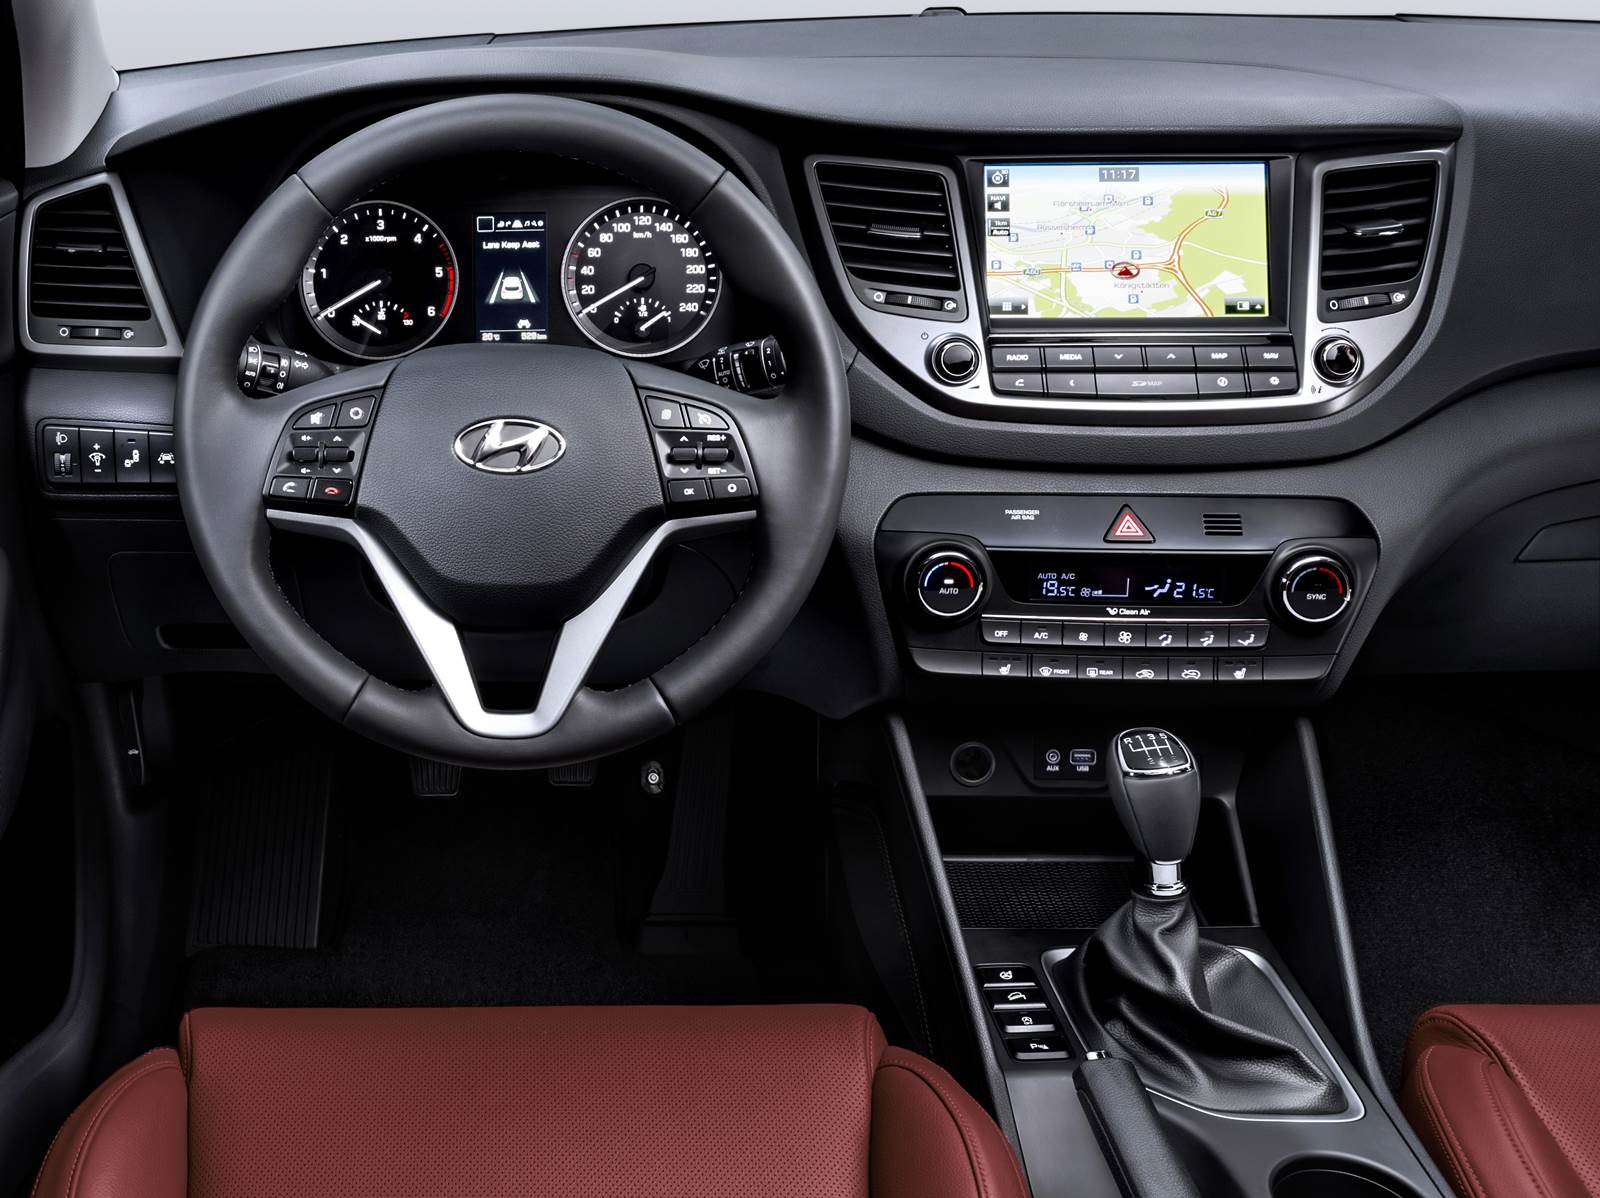 Novo Hyundai Tucson 2016 - painel